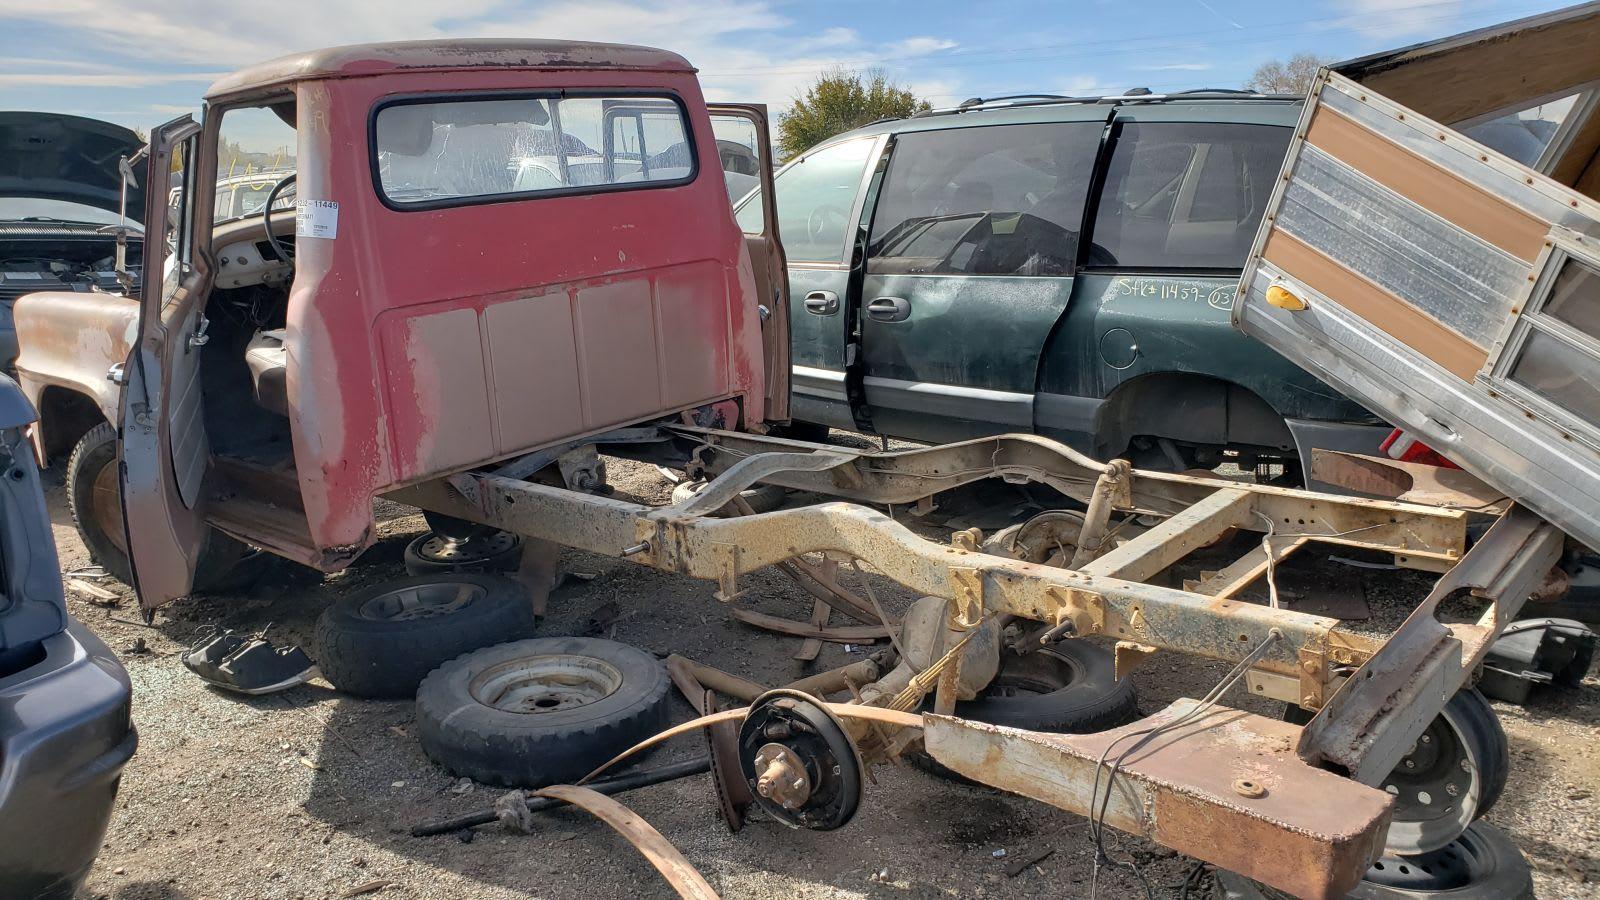 This 1959 International Harvester B 110 Pickup Truck Is A Junkyard Gem Autoblog